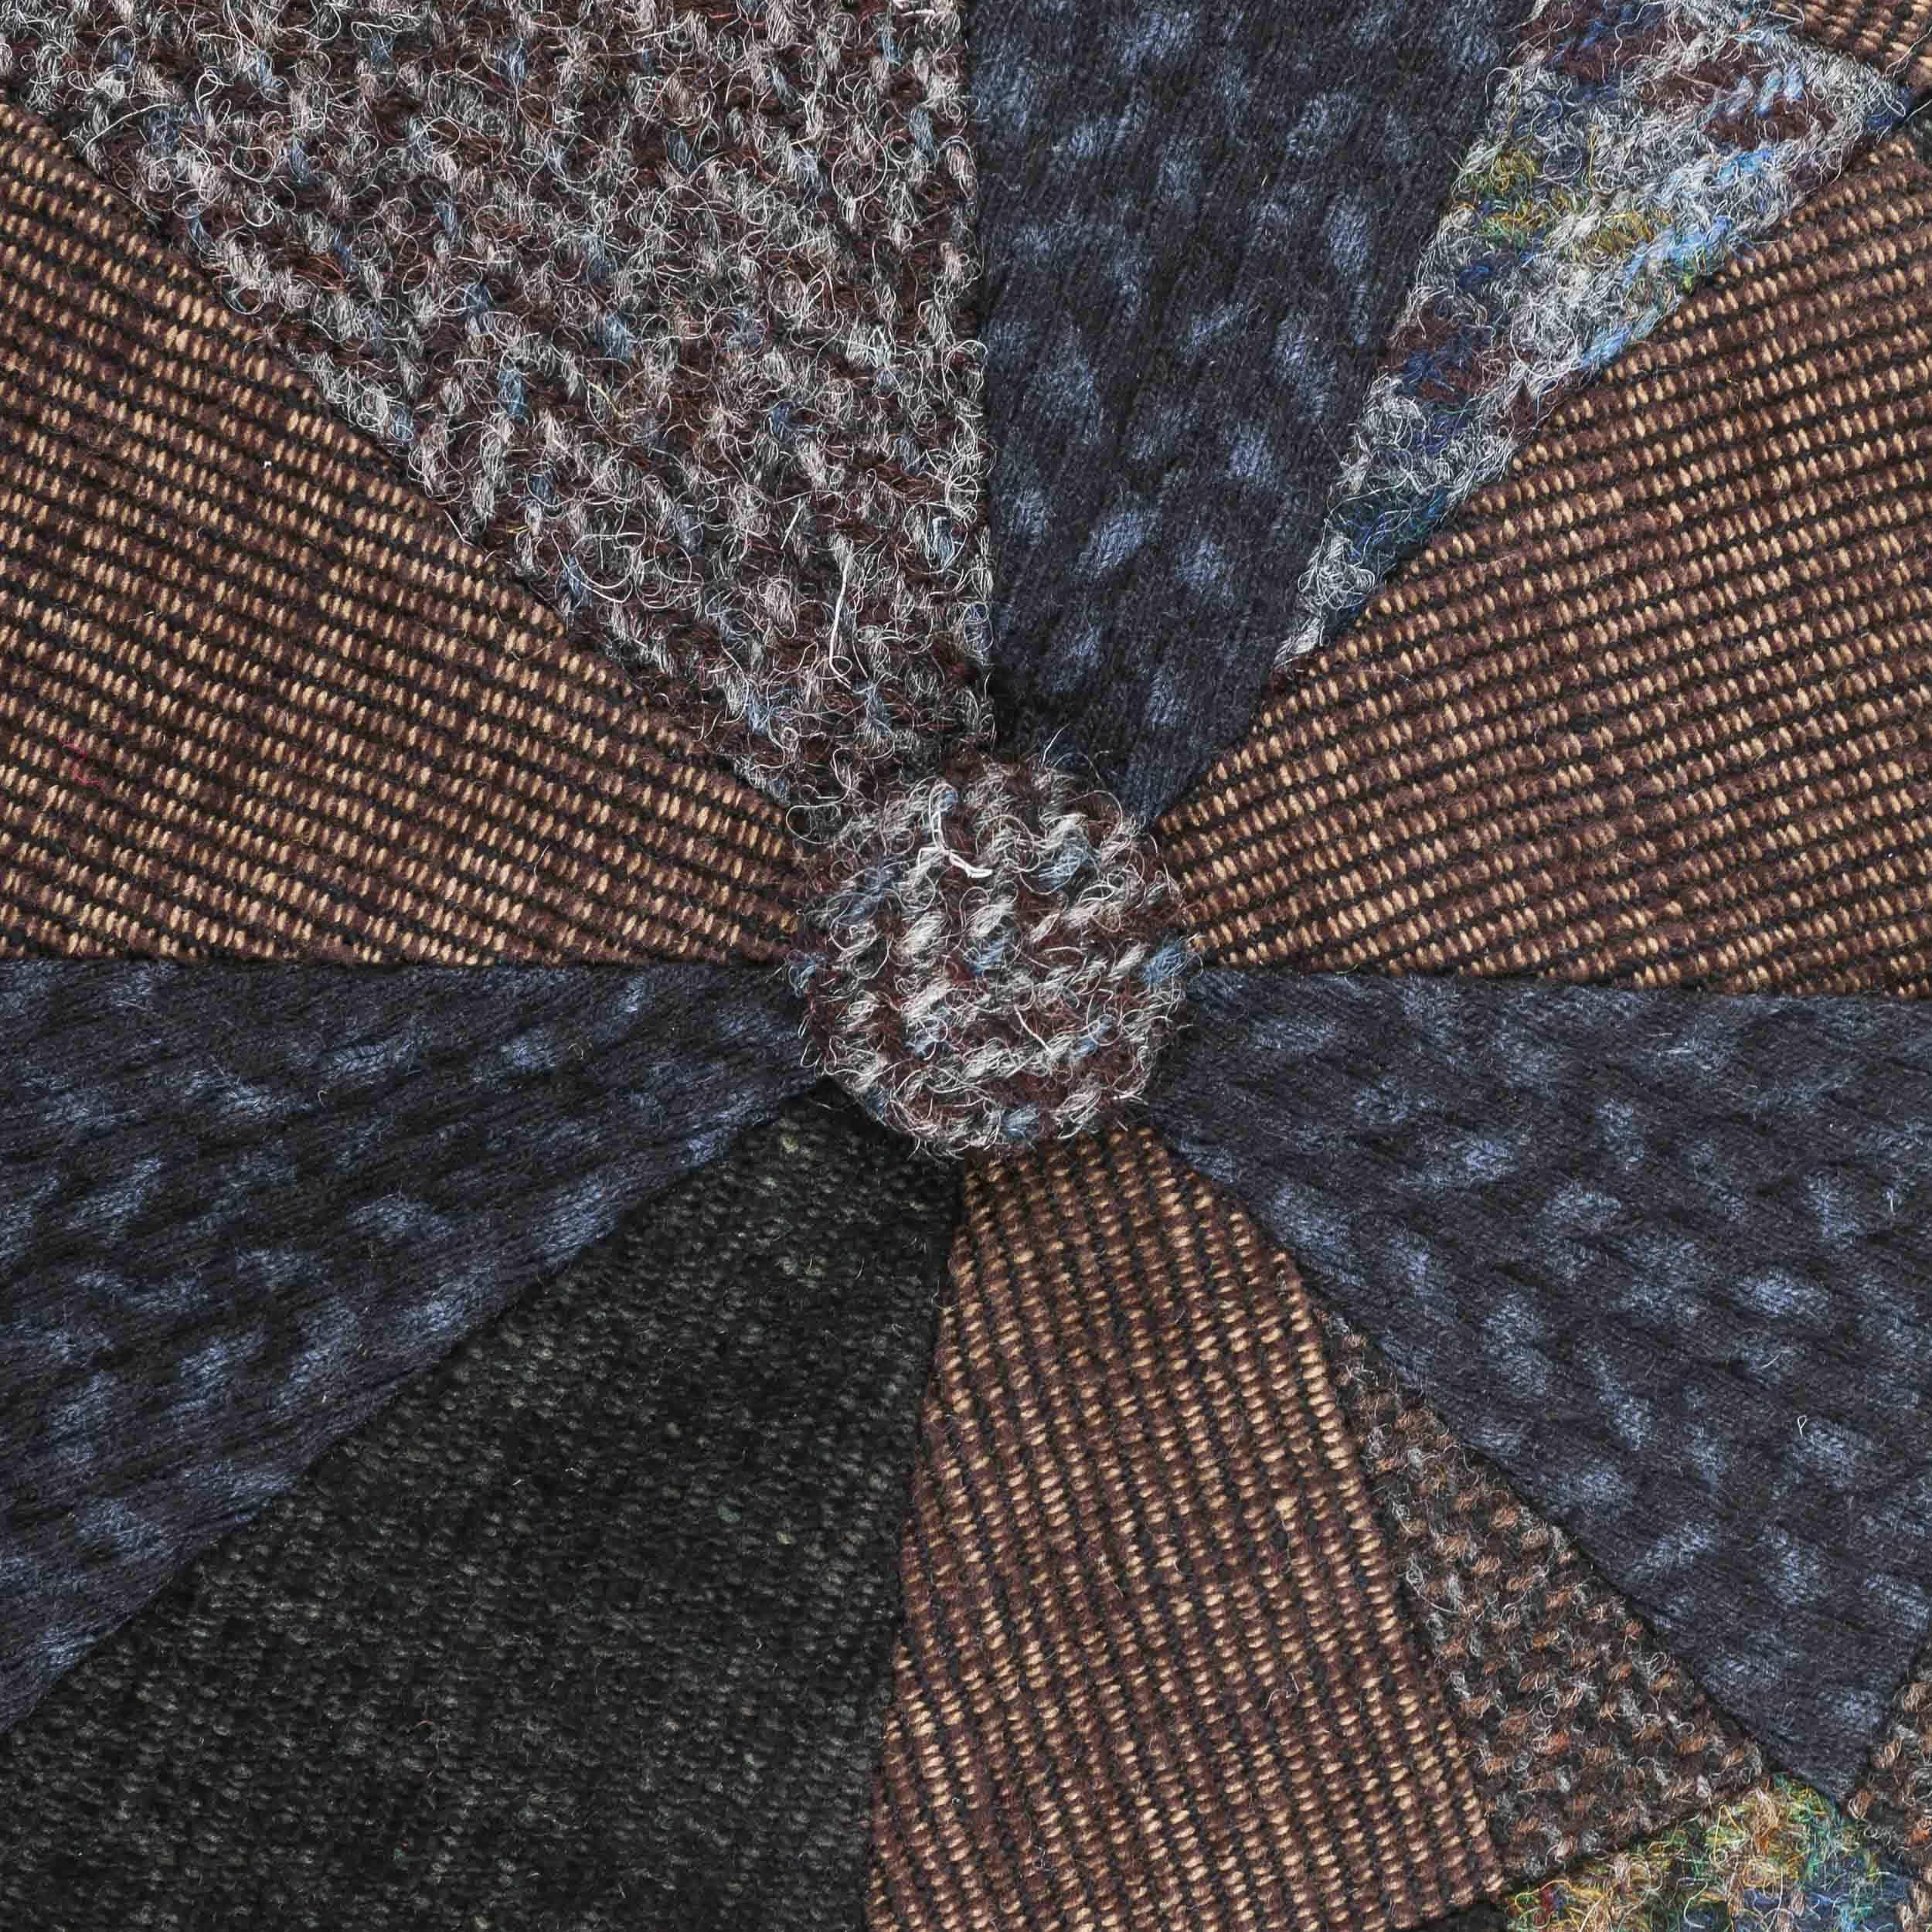 528b7506 ... Hatteras Handmade Patchwork Flat Cap by Stetson - brown 4 ...